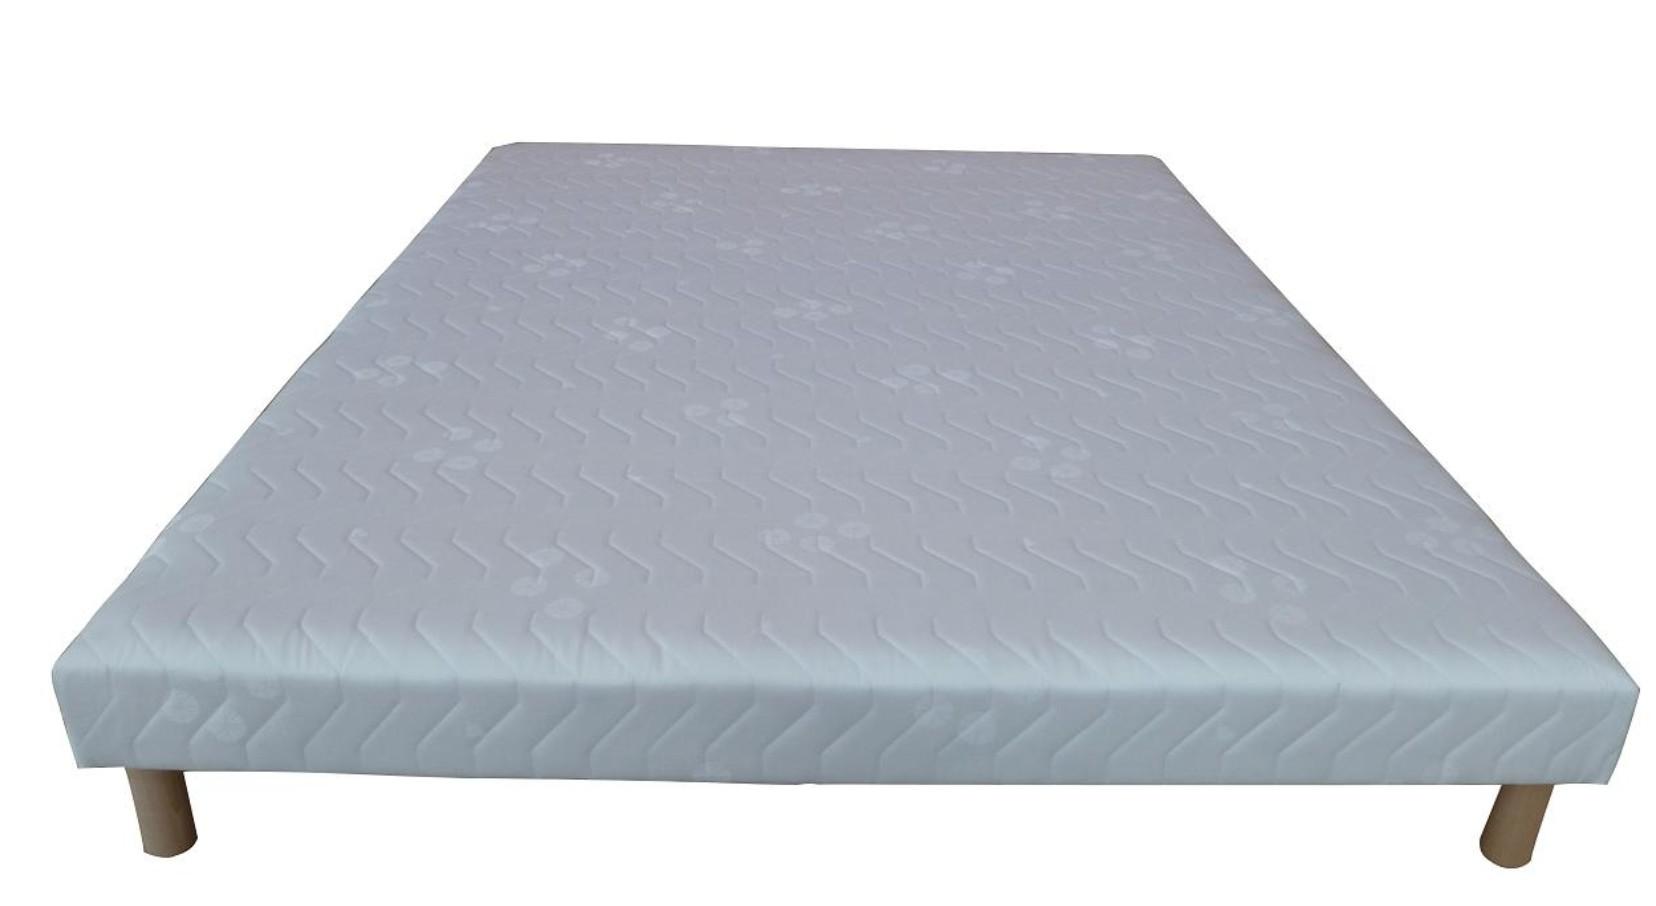 sommier tapissier blanc 140x190cm univers. Black Bedroom Furniture Sets. Home Design Ideas